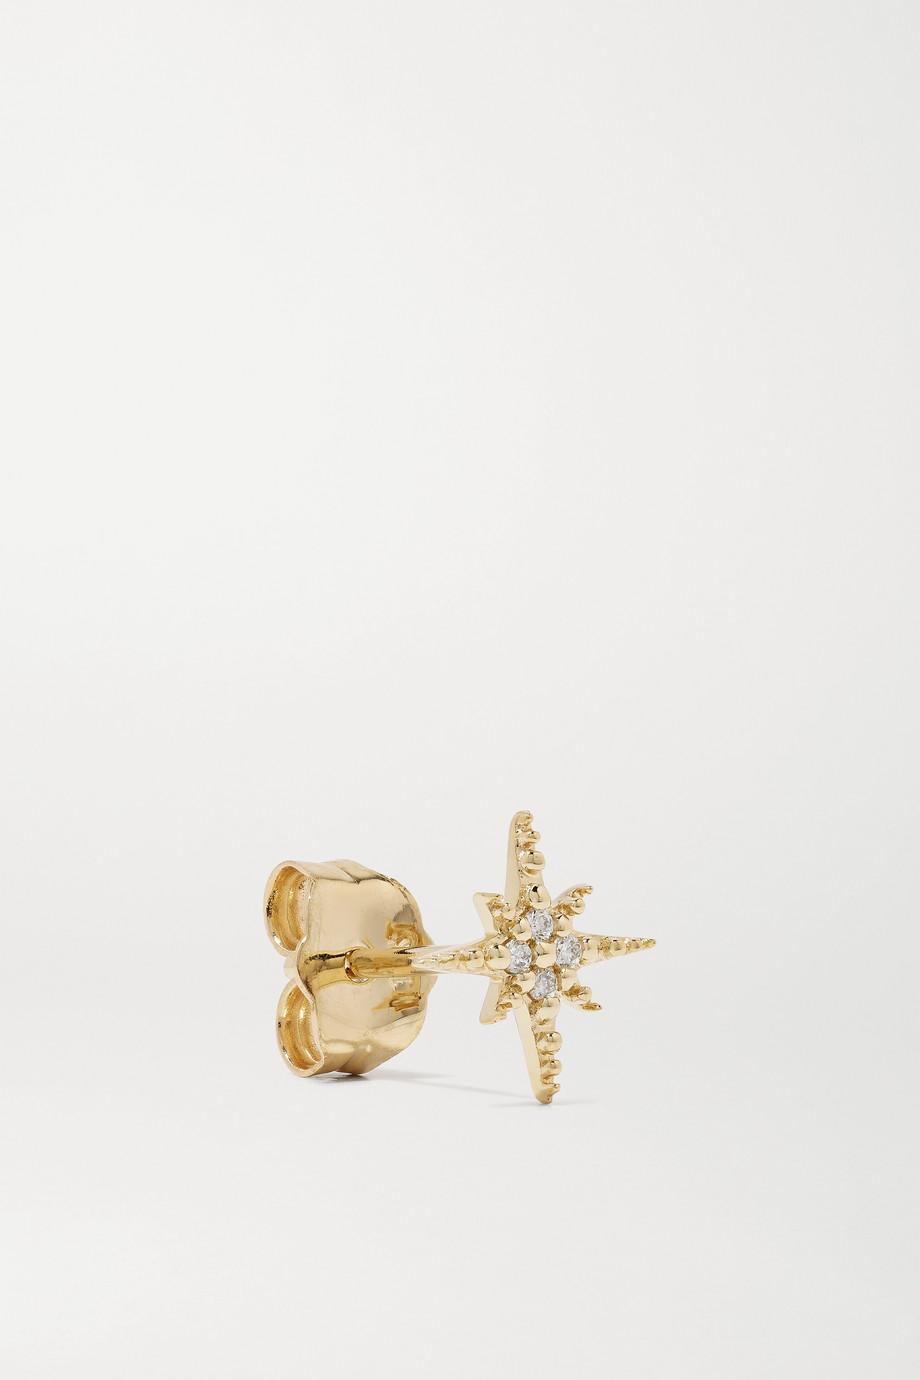 Sydney Evan Mini Starburst 14-karat gold diamond earrings